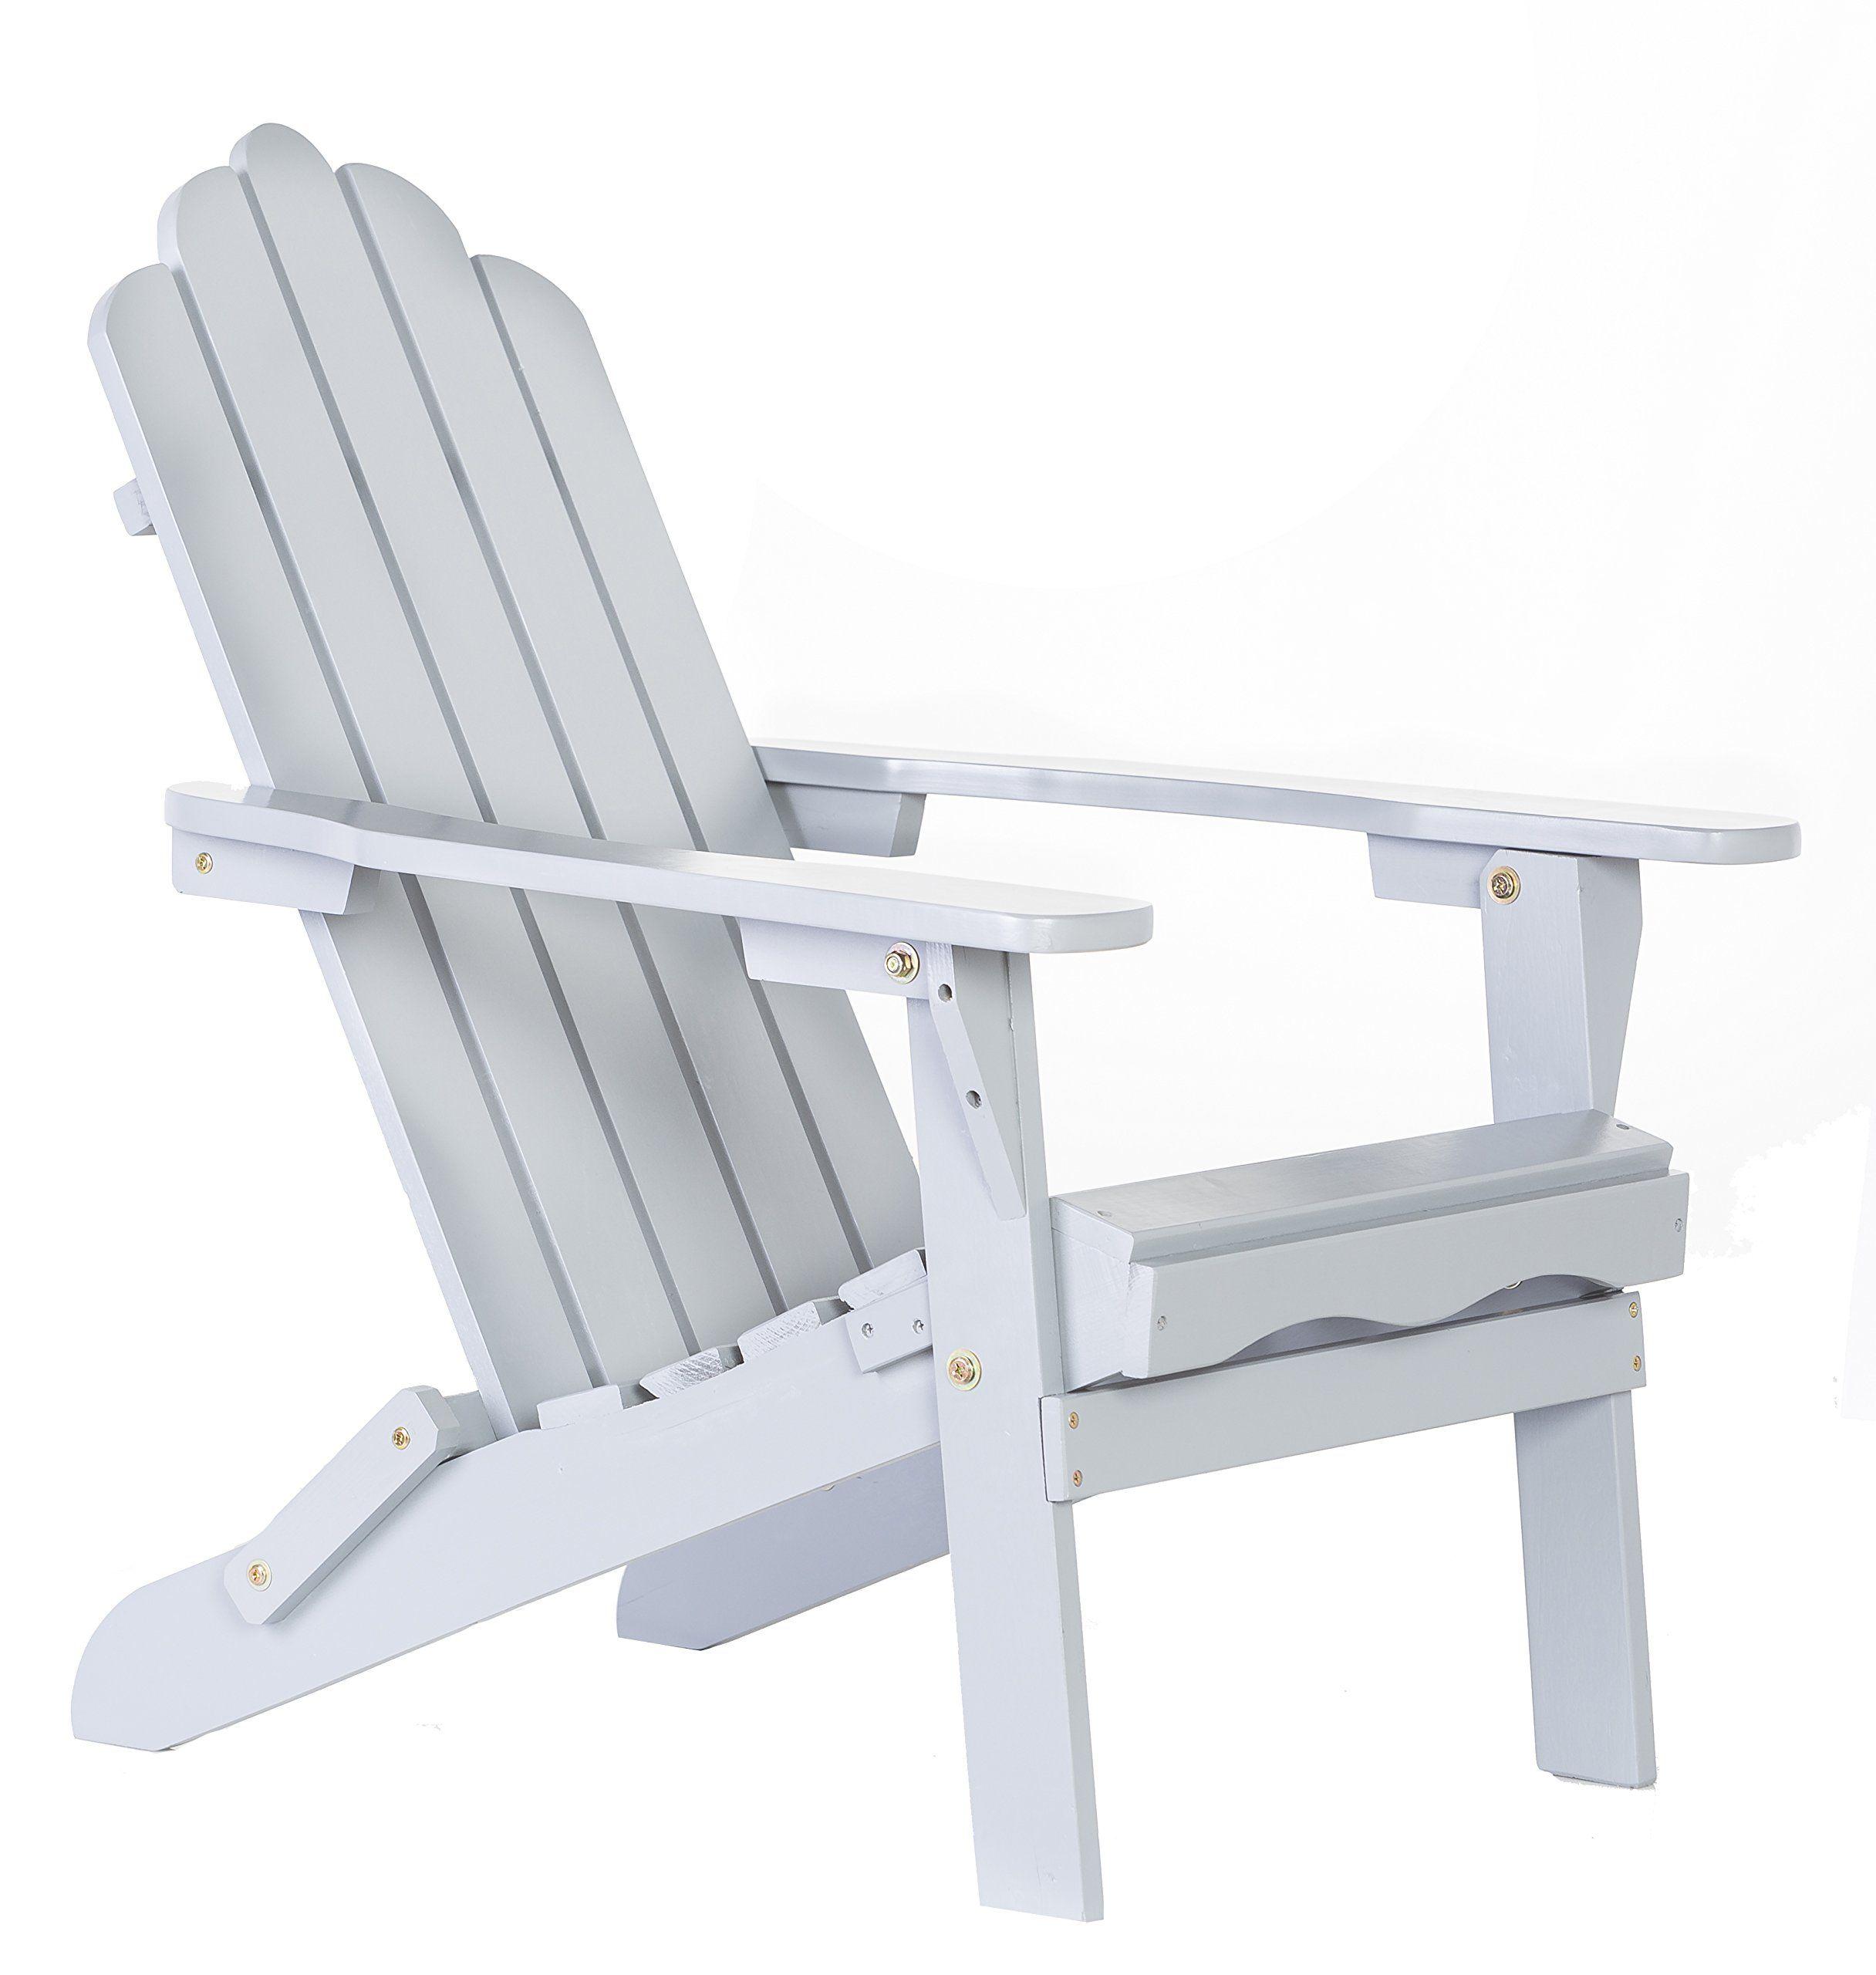 Table in a bag grey wood folding adirondack chair designer chair